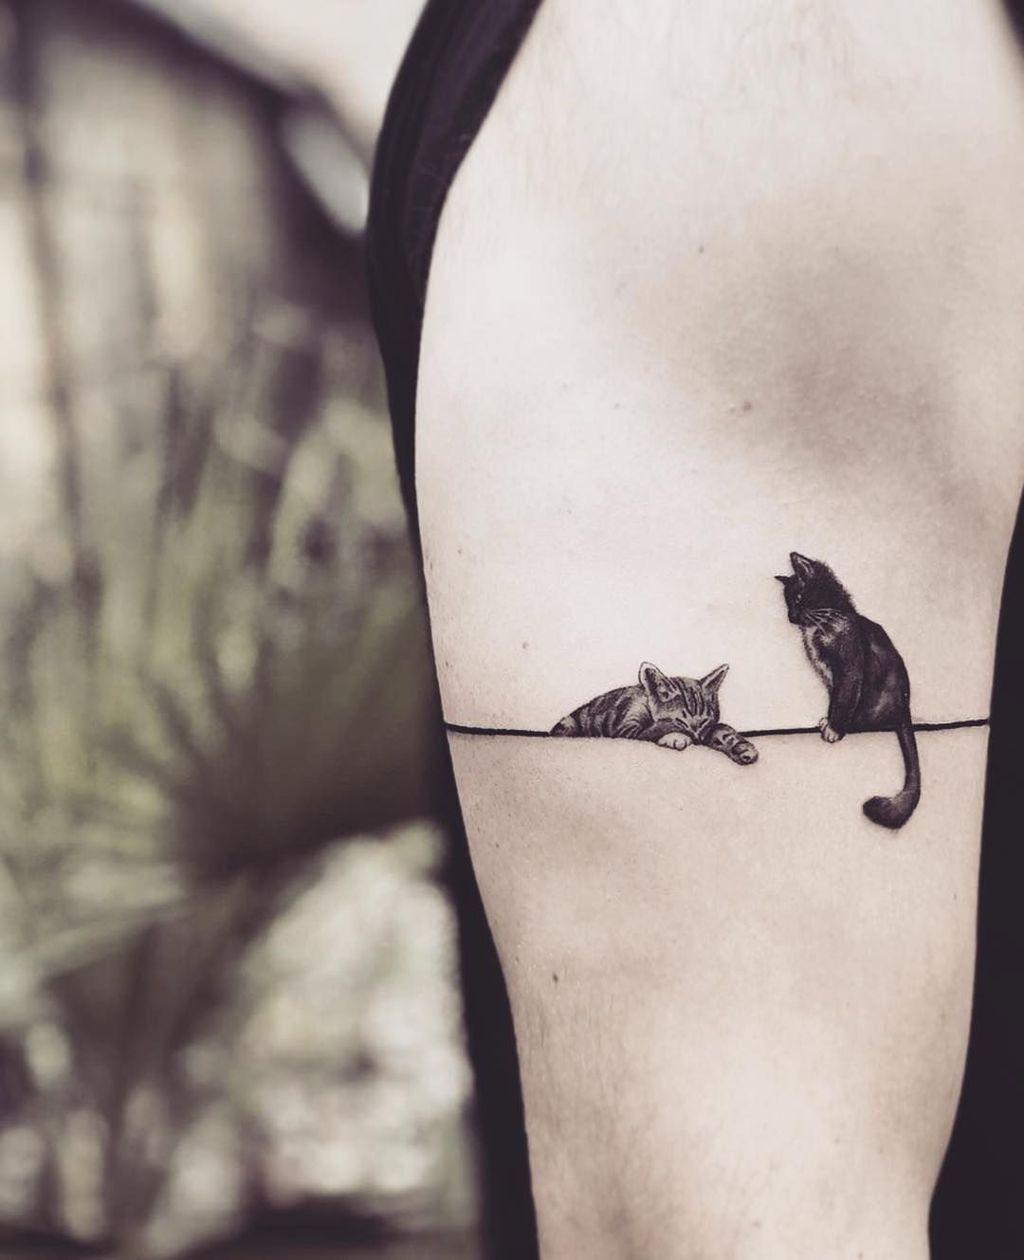 20 Splendid Animals Tattoo Ideas That Will Give You Inspiration In 2020 Small Animal Tattoos Cute Animal Tattoos Cat Tattoo Designs